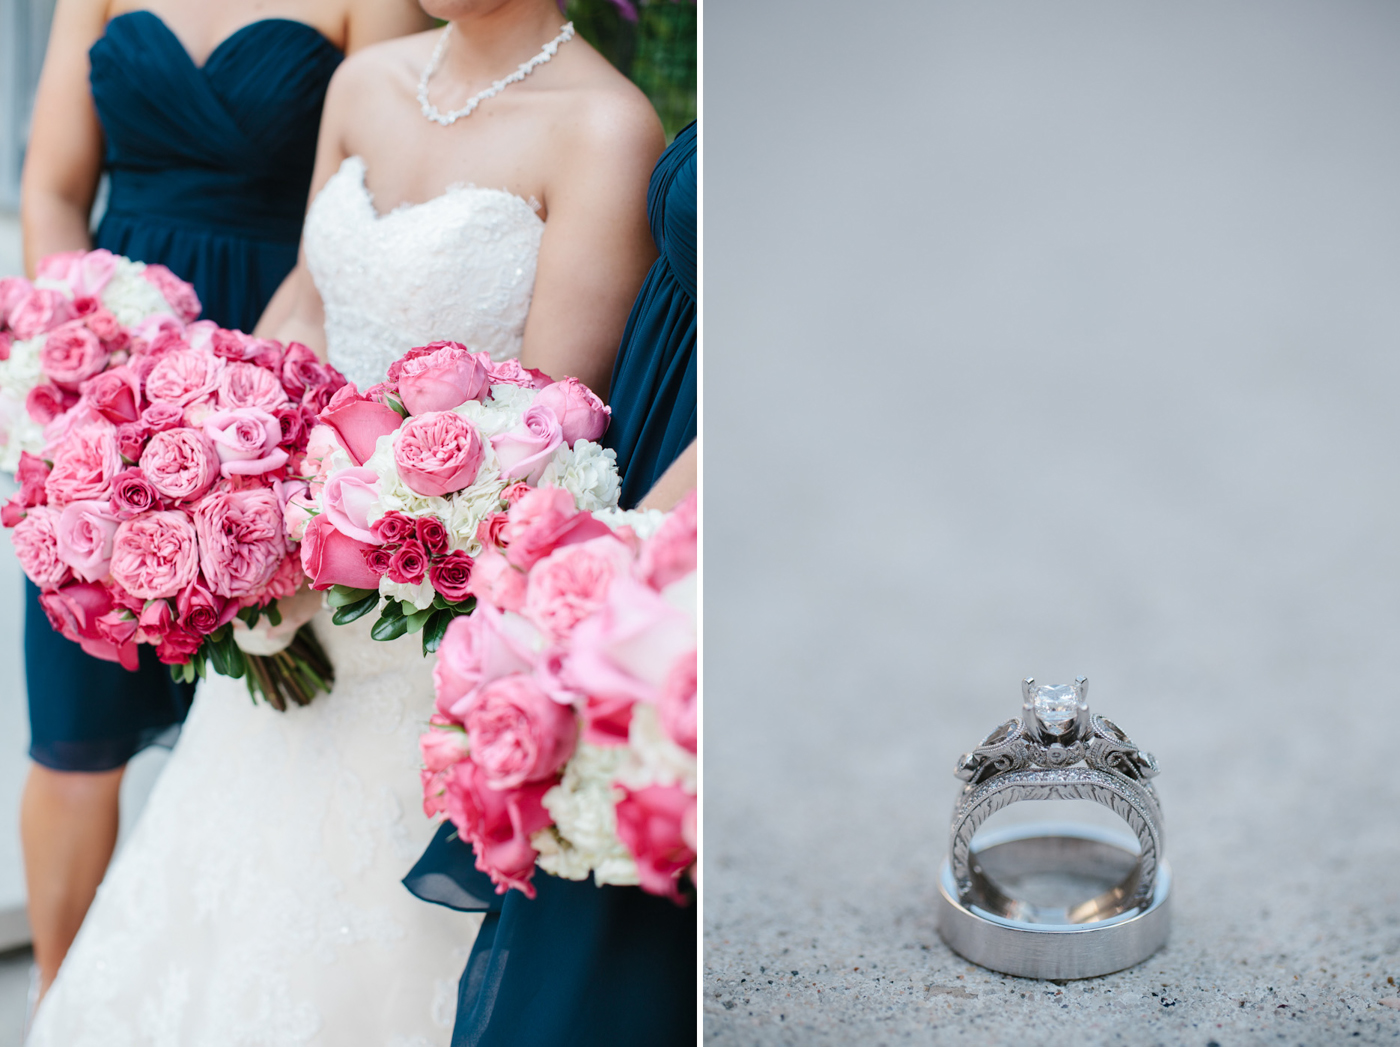 St-Louis-Wedding-Photography-1022.jpg